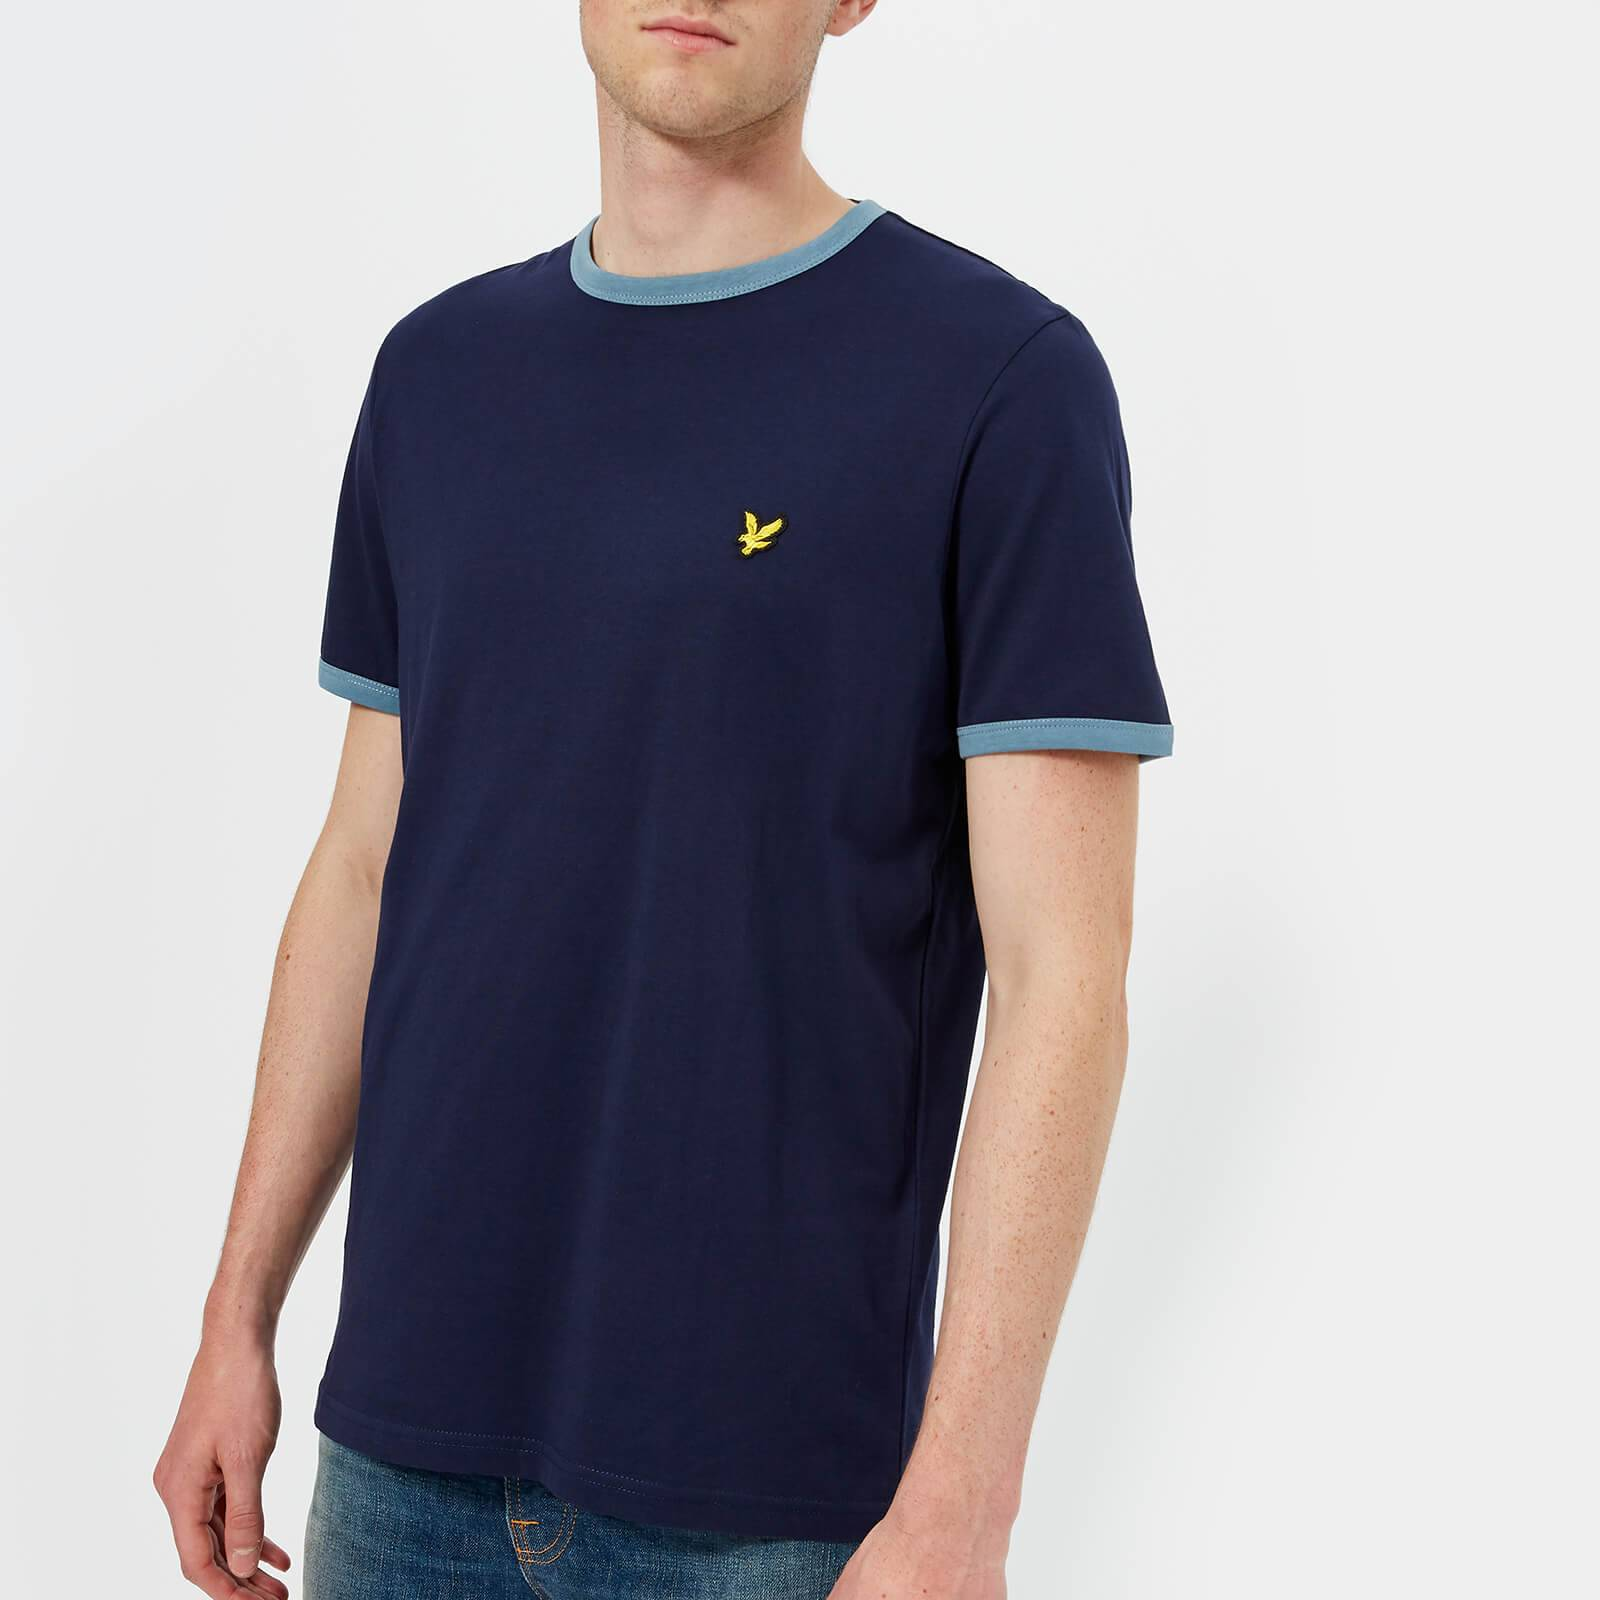 Scott Lyle & Scott Men's Ringer T-Shirt - Navy - XL - Navy